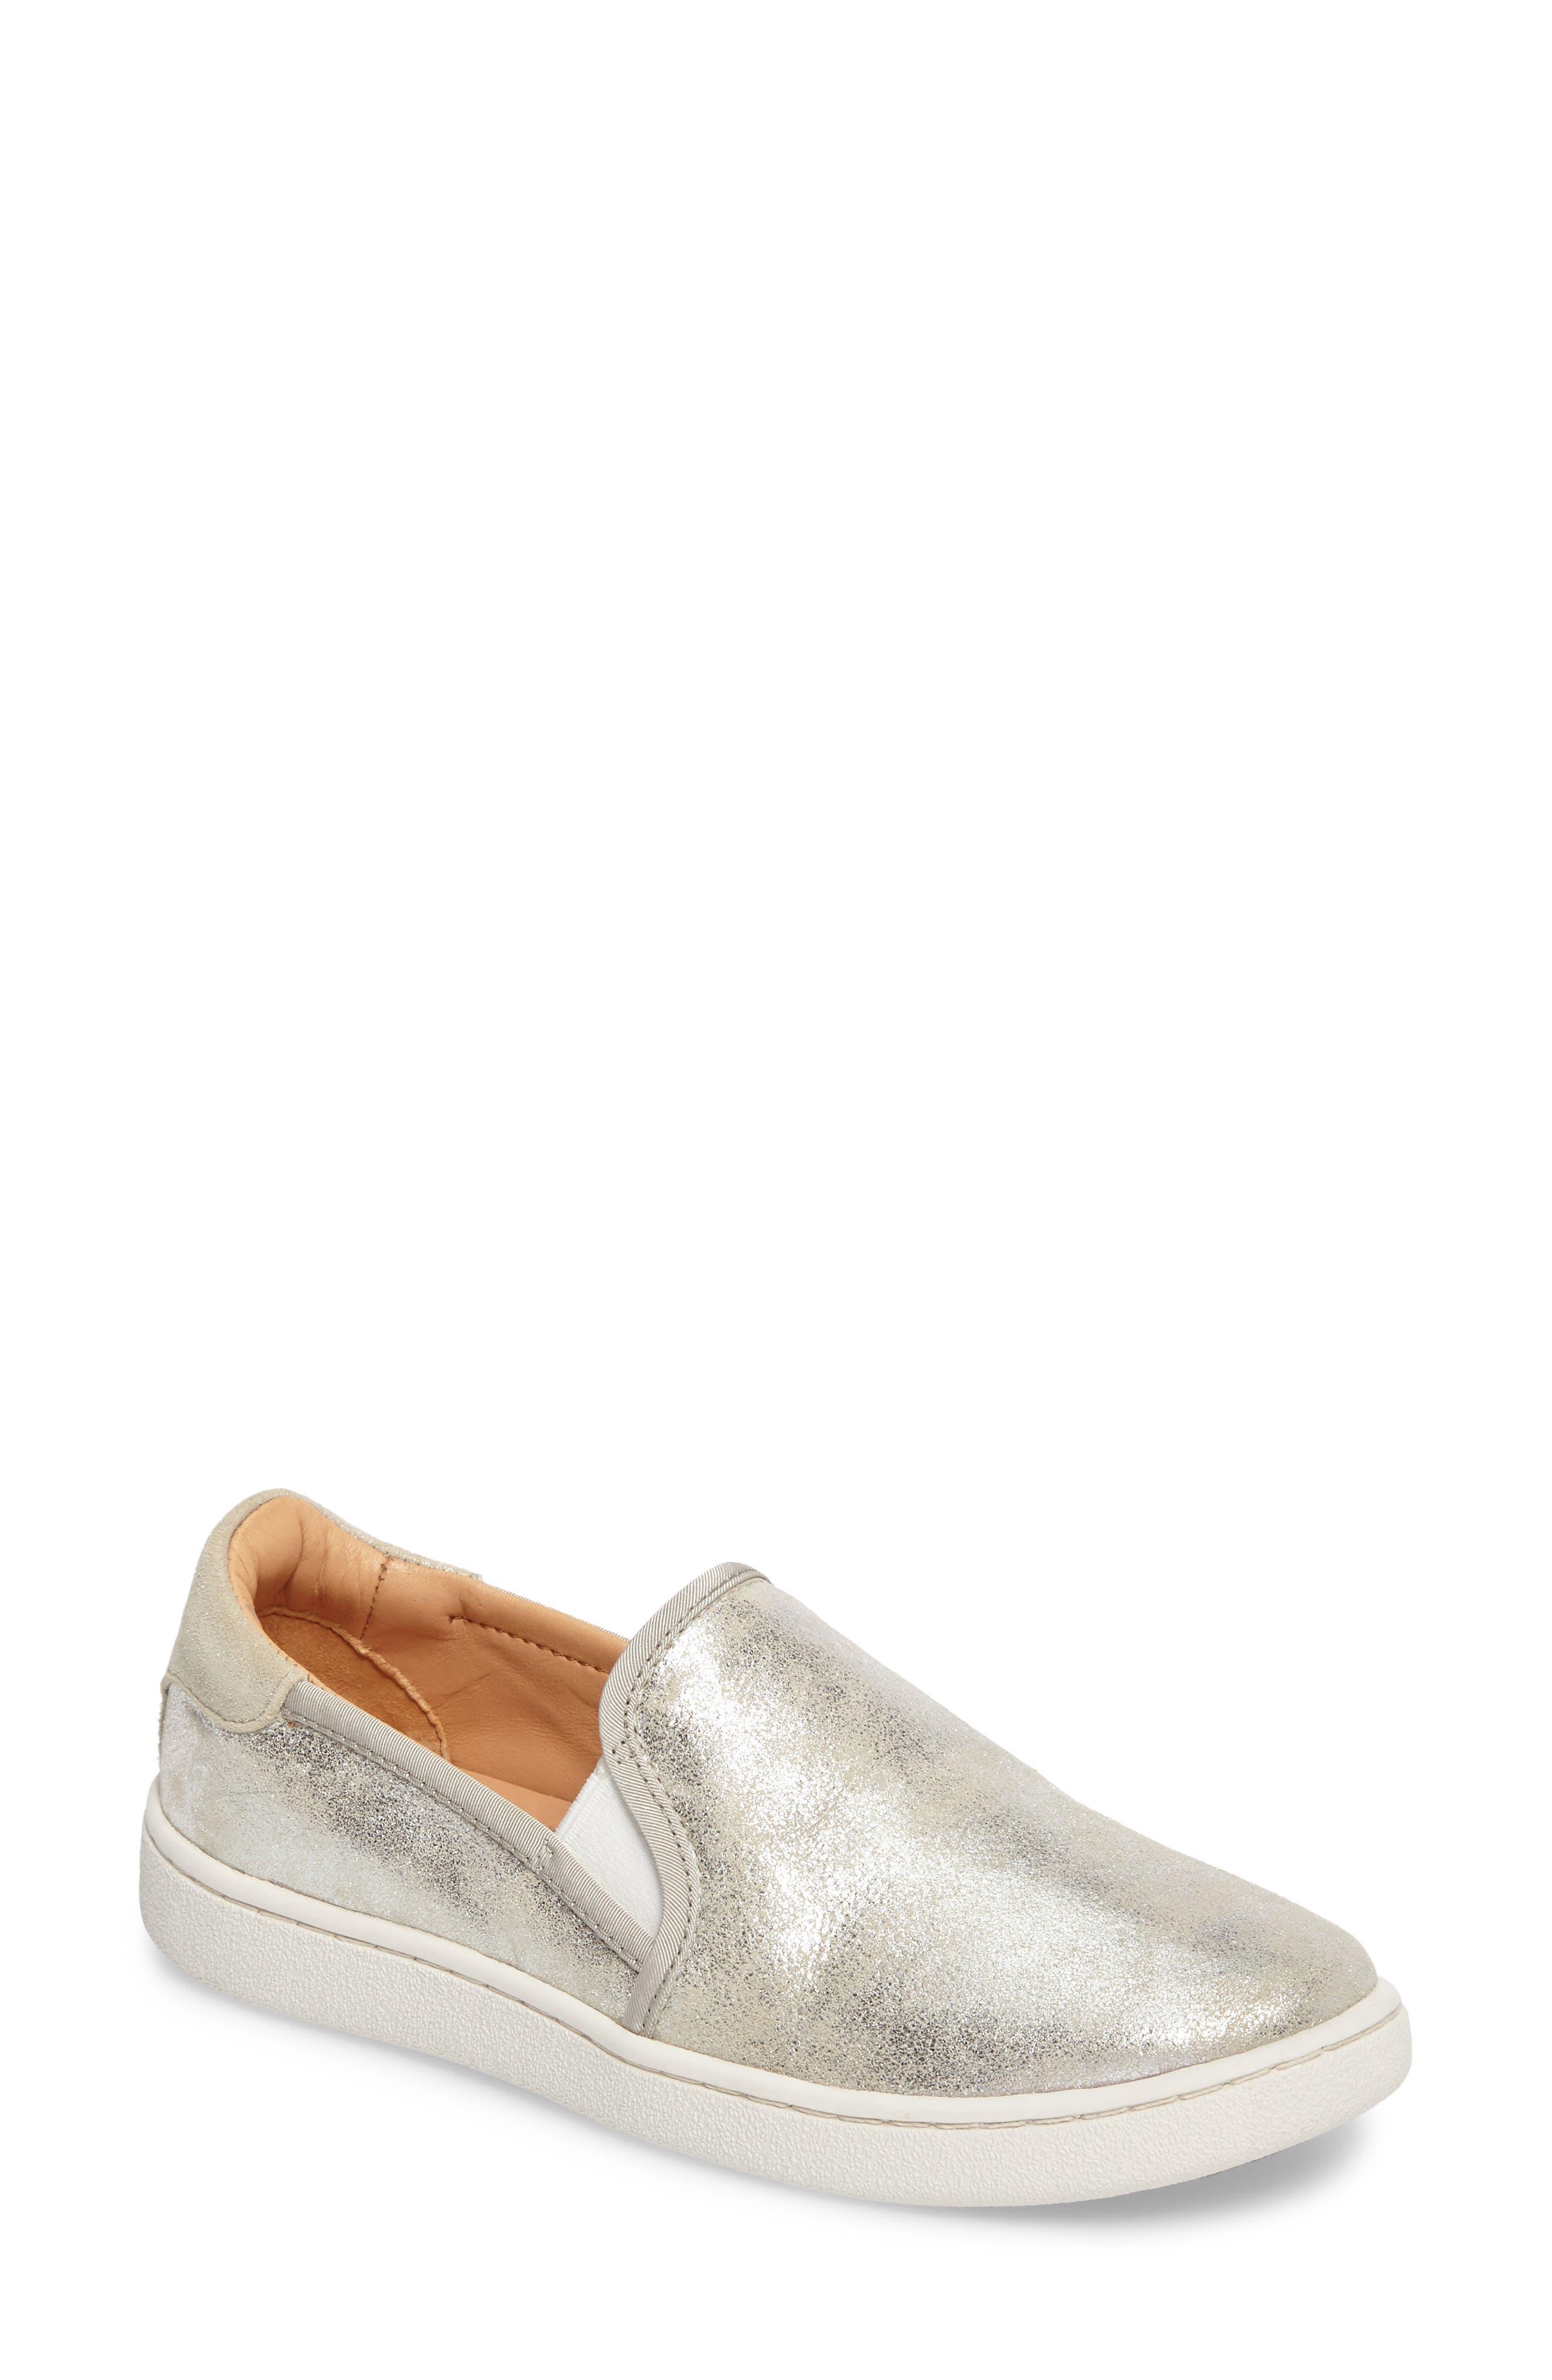 Cas Stardust Slip-On Sneaker,                         Main,                         color, 040